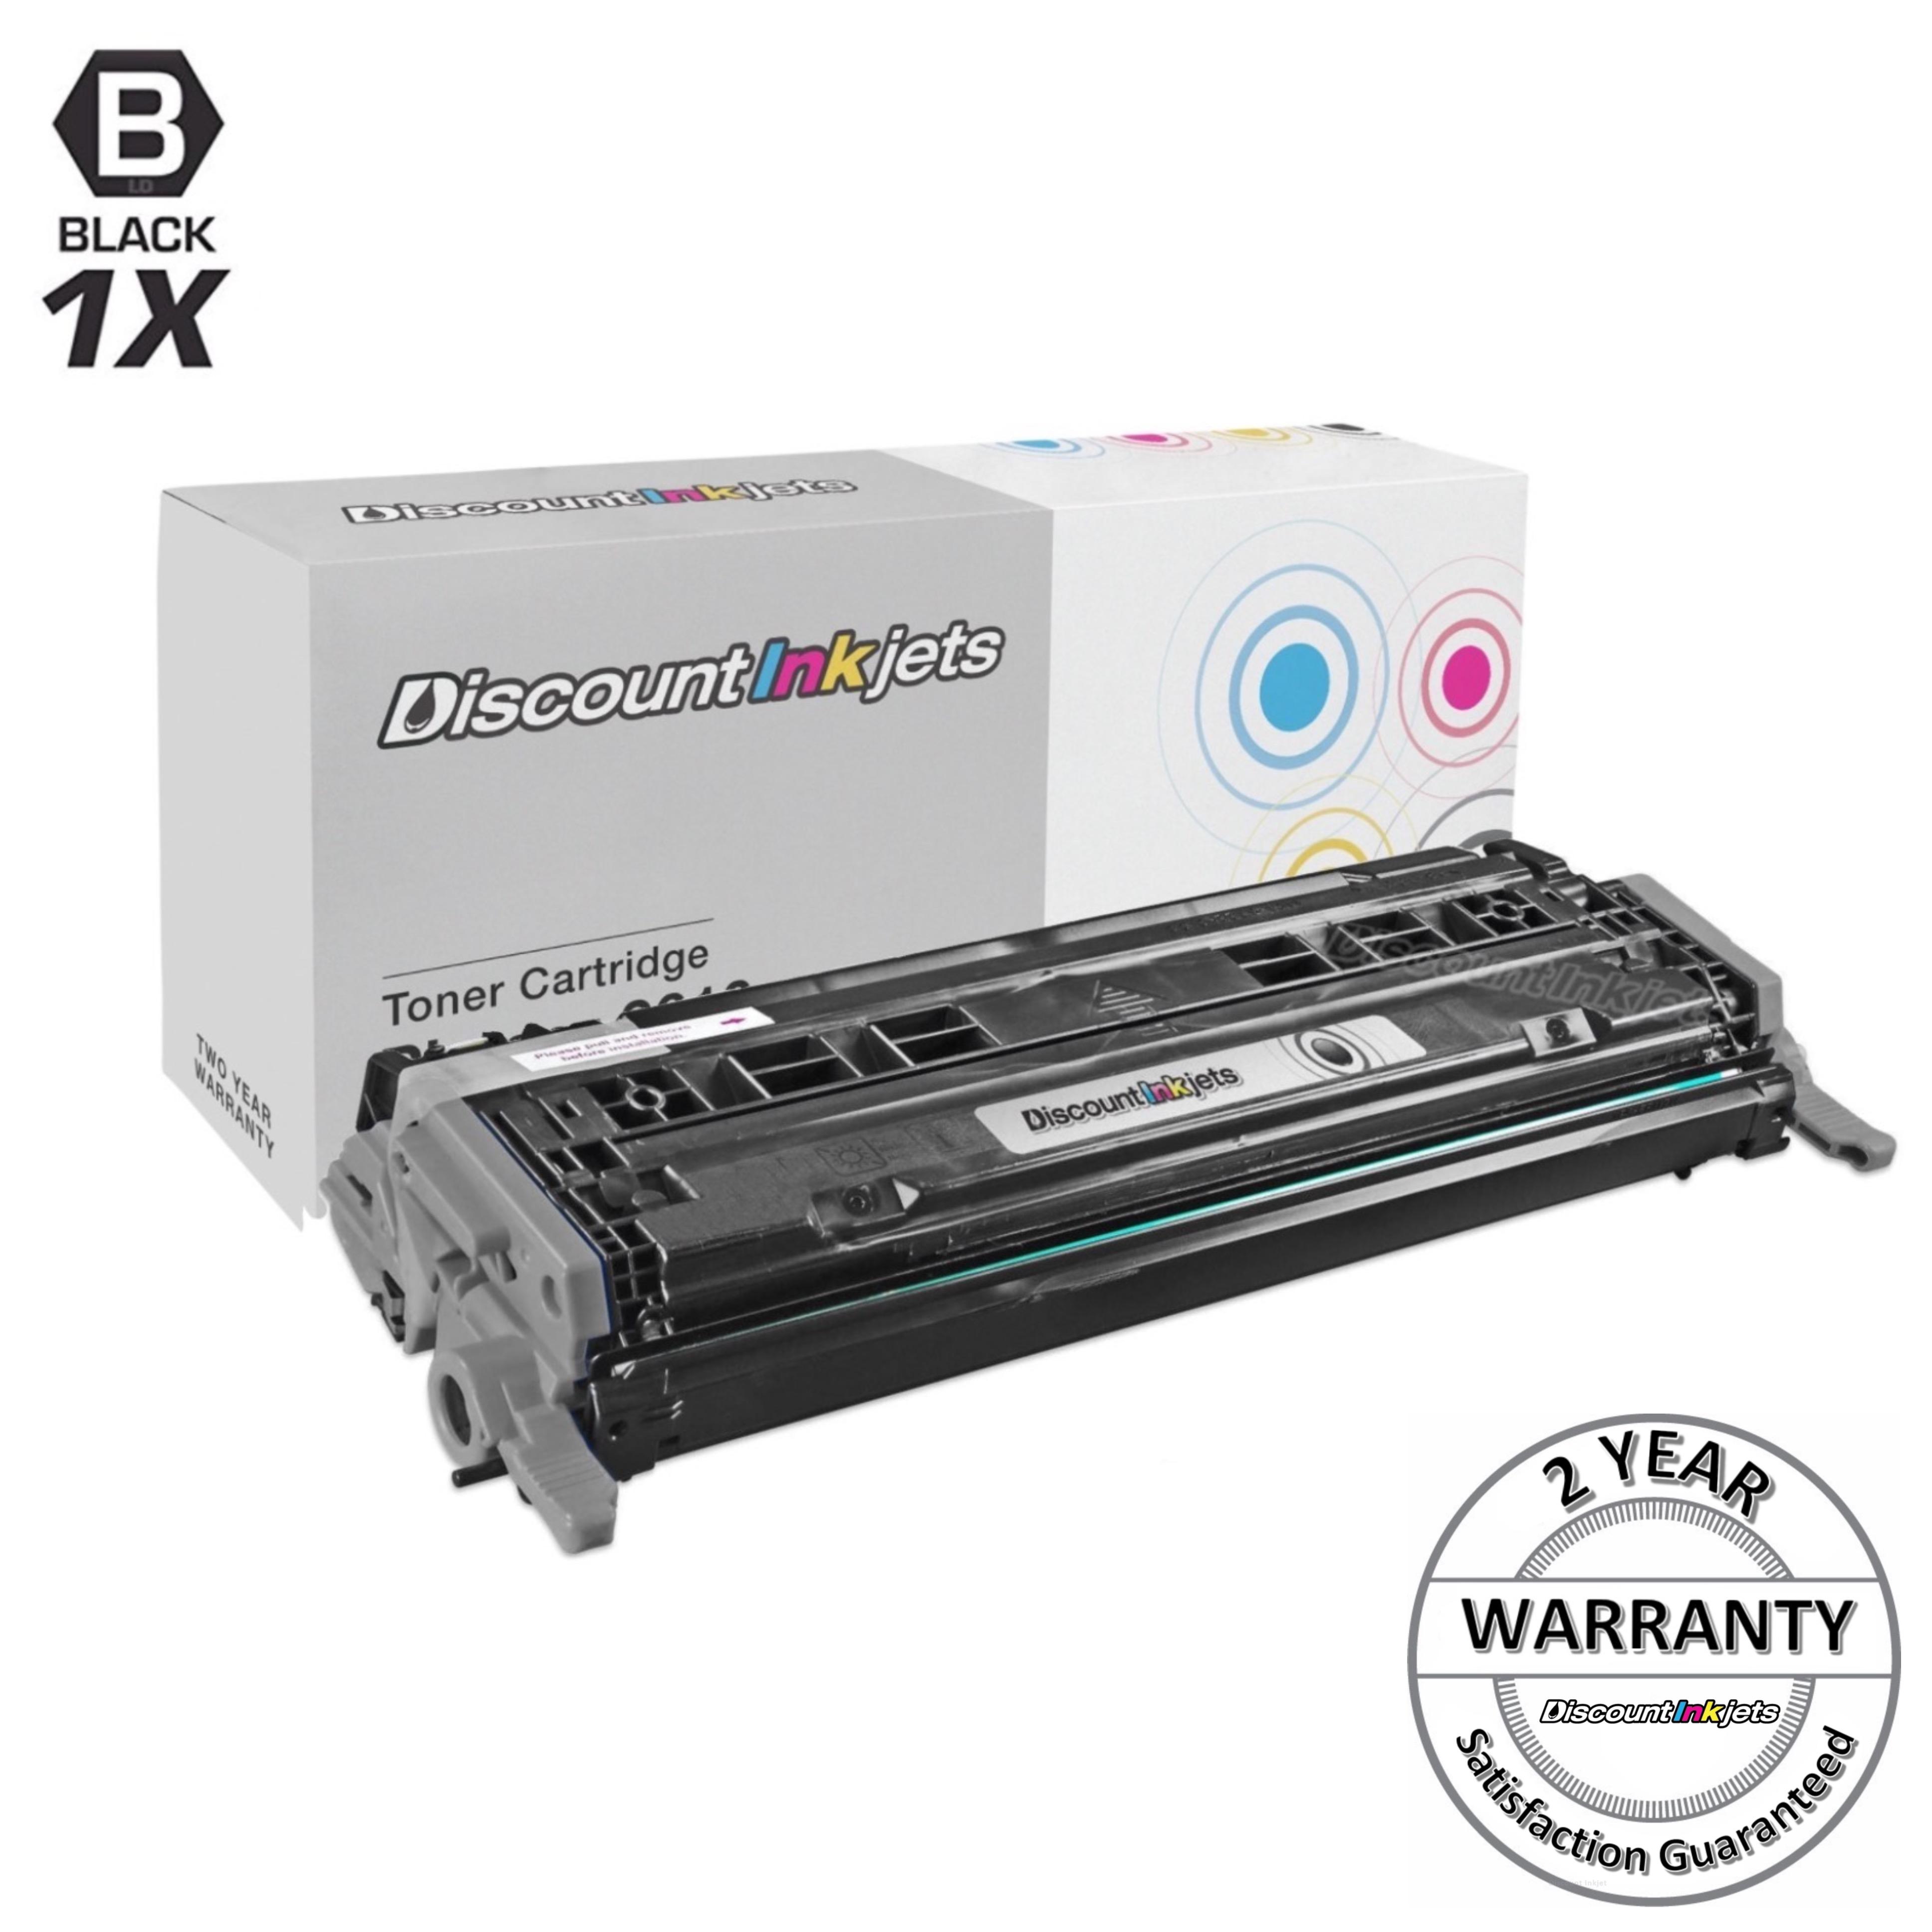 HP Color LaserJet 2600n, 2605dn, 2605dtn, CM1015mfp, CM1017mfp, 1600